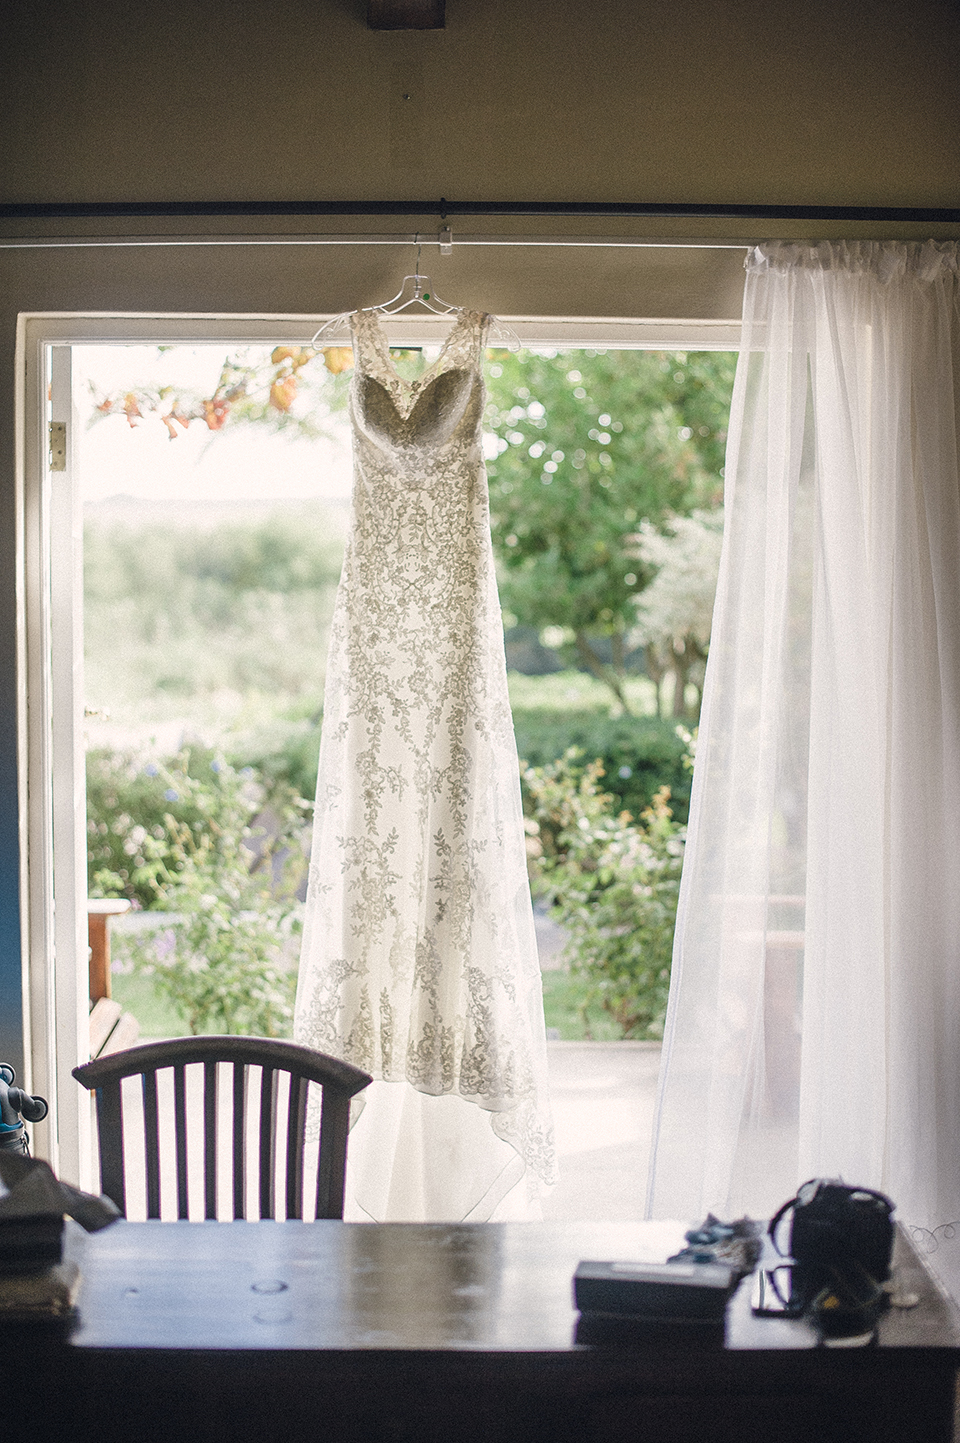 RyanParker_WeddingPhotographer_FineArt_CapeTown_Robertson_PatBusch_Hermanus_M&S_DSC_2867.jpg